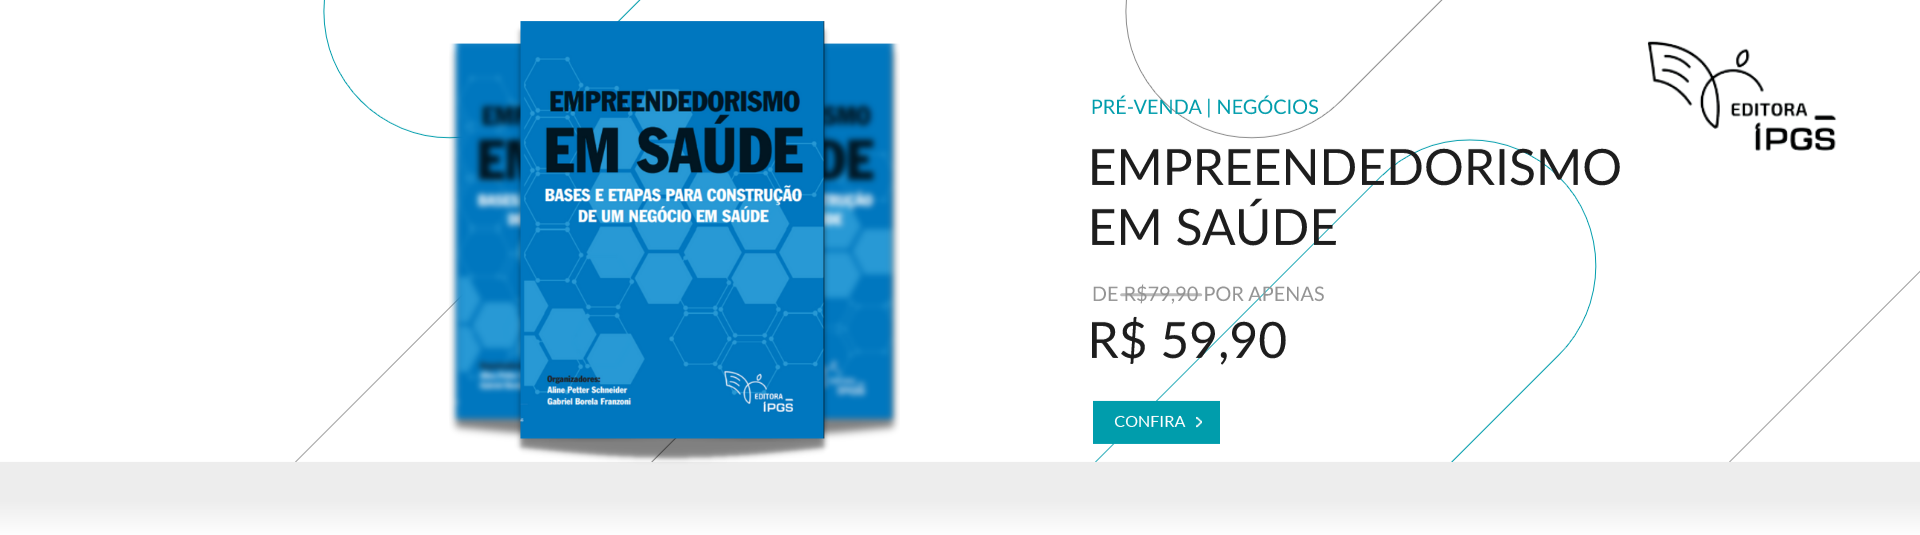 banner livro empreendedorismo